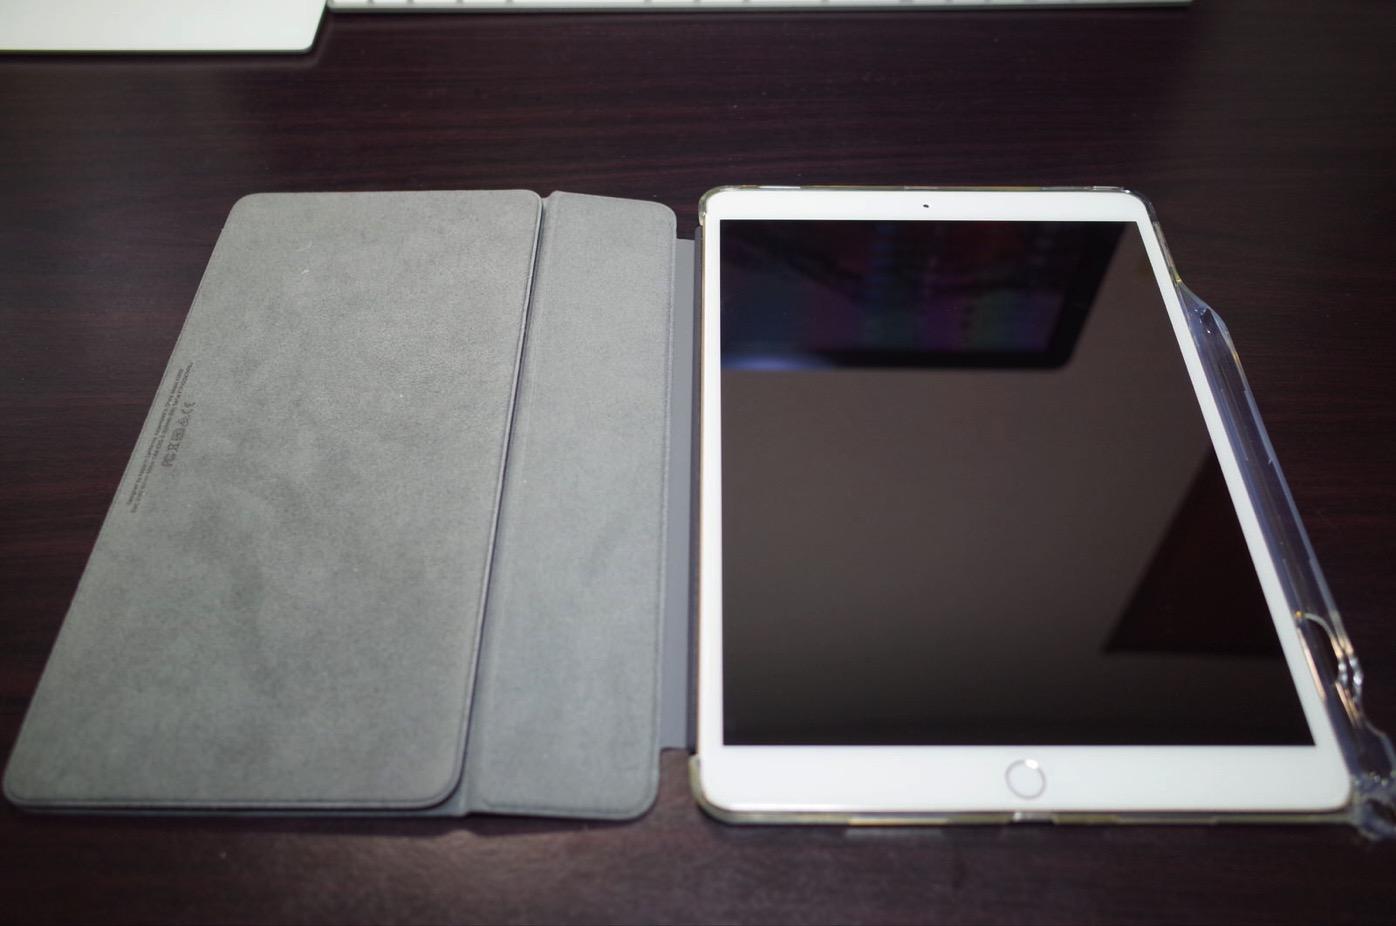 iPad Pro 10.5 ケース Poetic -[Lumos Series]- アップル 10.5型 アイパッド プロ 対応 [ウルトラスリム] [TPU製 ケース] Smart Keyboard 対応 Apple Pencil 収納スロット付き (クリスタルクリア)-12